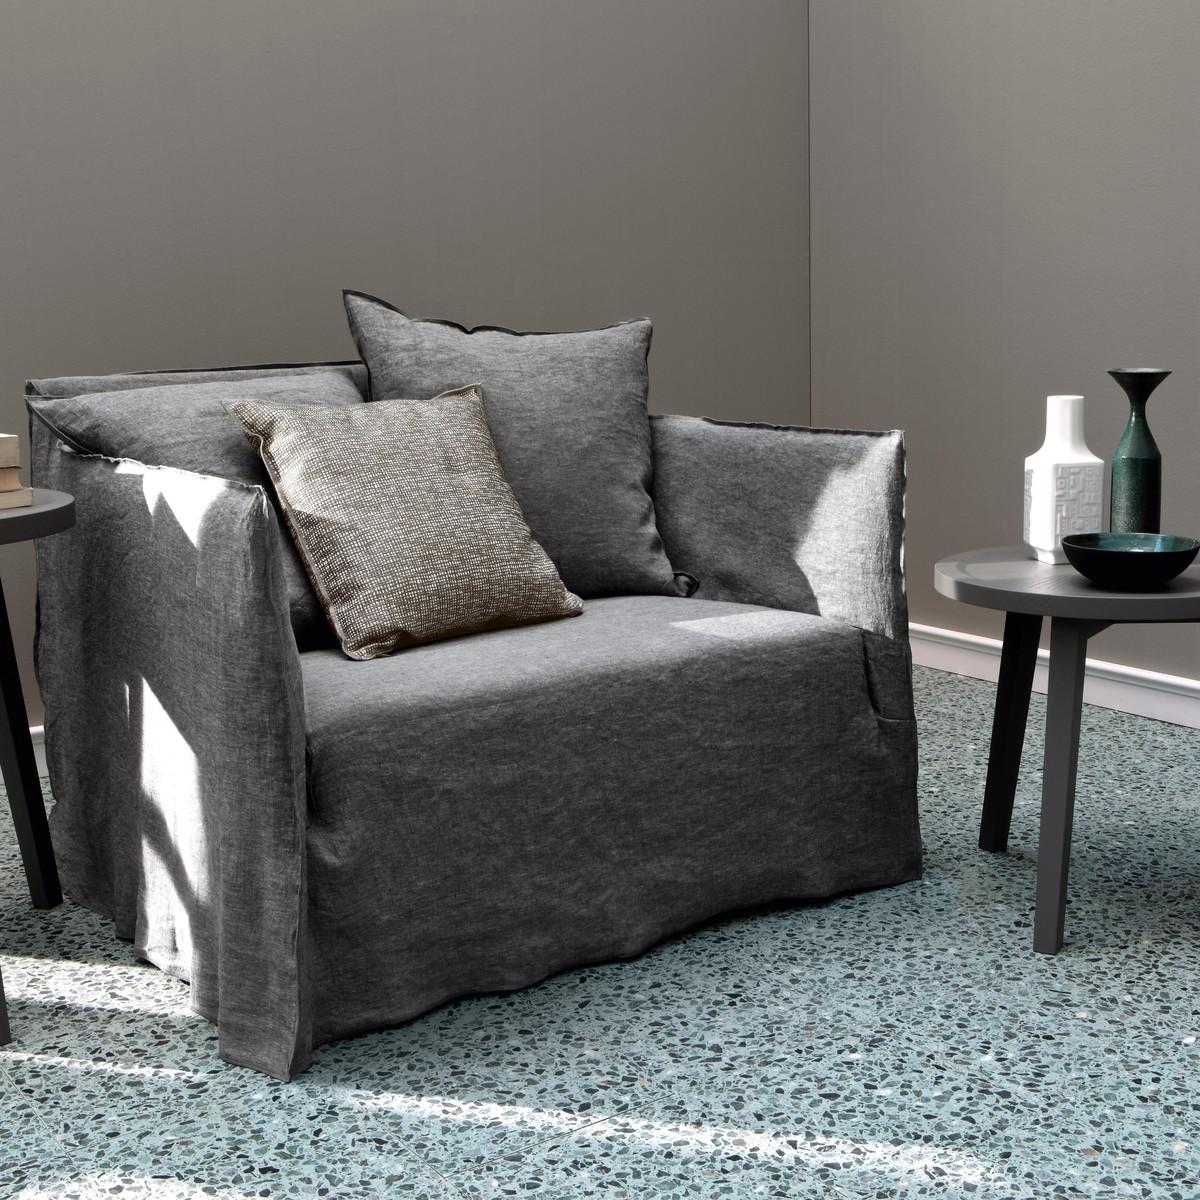 Ghost 09 lounge armchair gervasoni for Gervasoni furniture